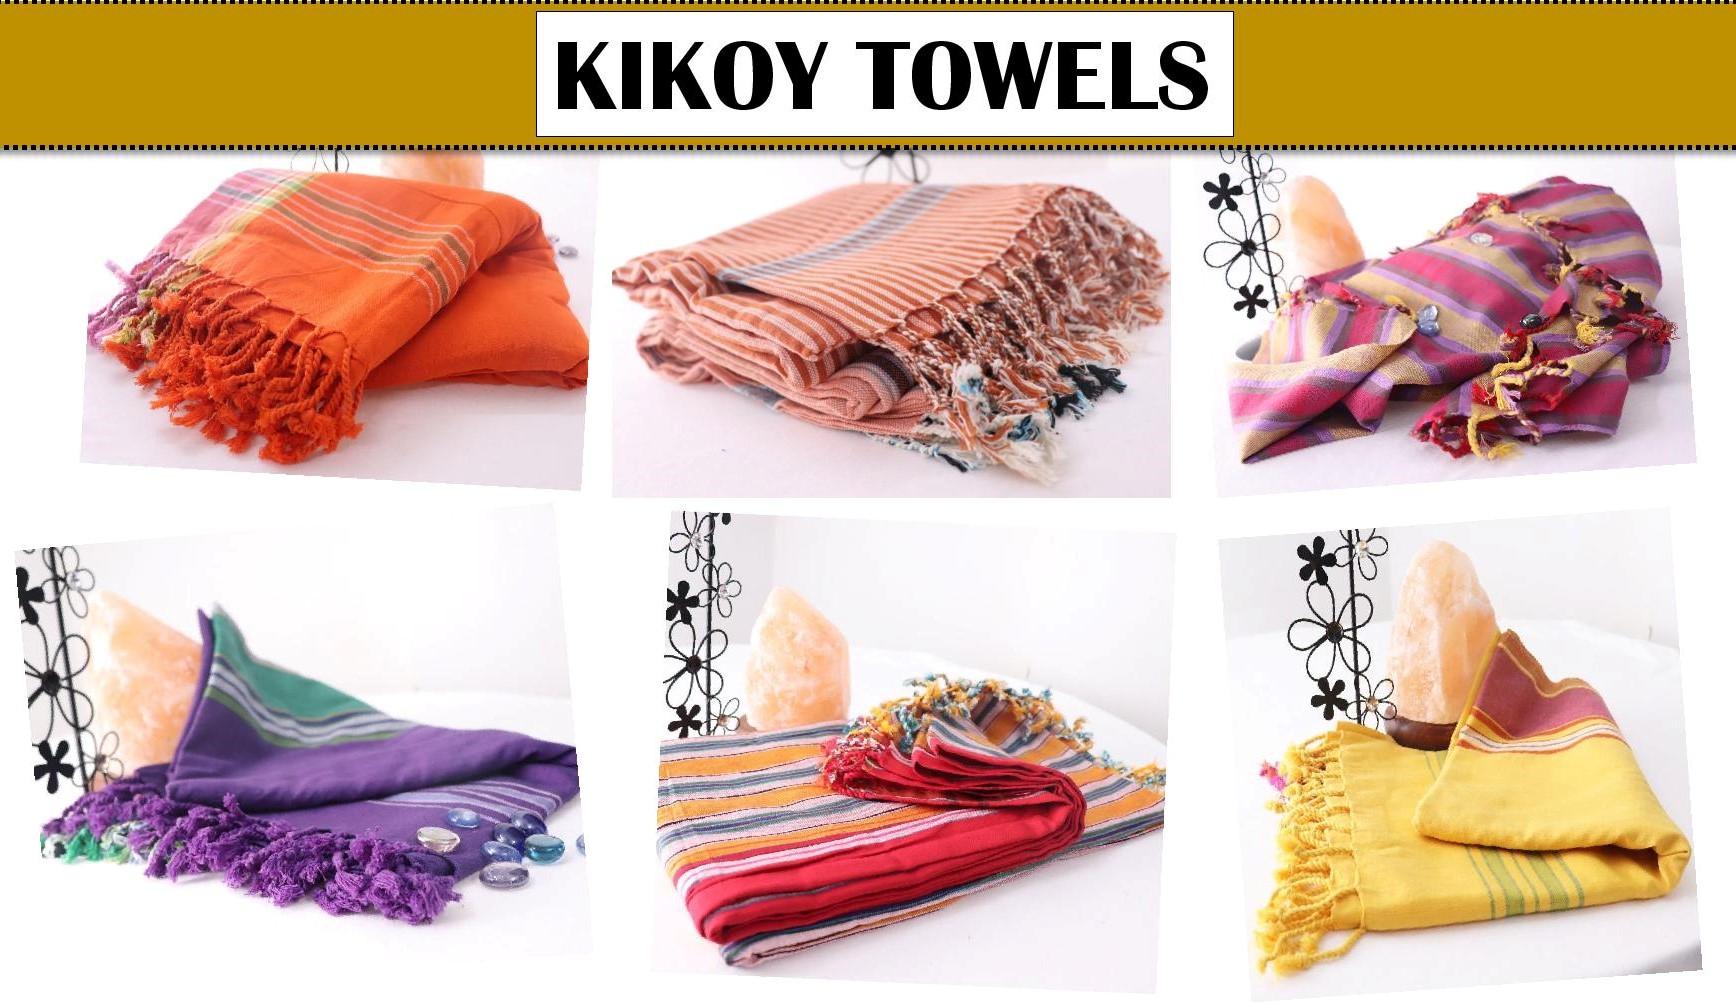 Promotional kikoy towel with bag